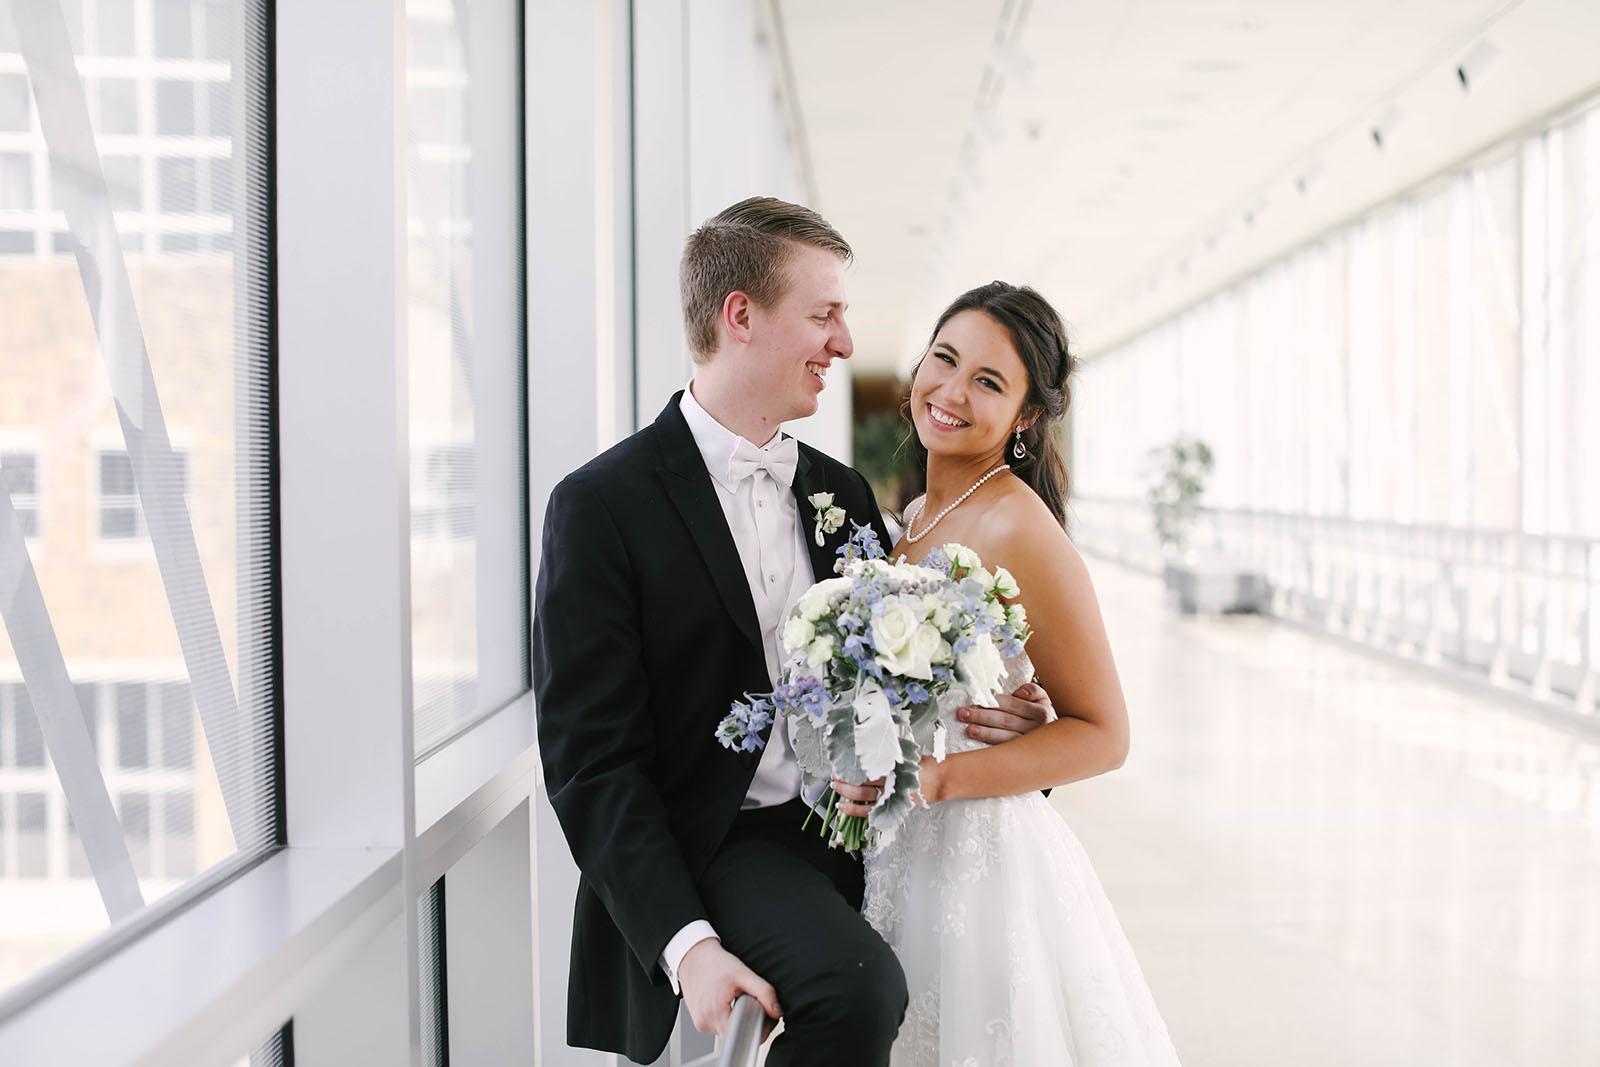 Wedding Photos on the Canal Overlook Bridge